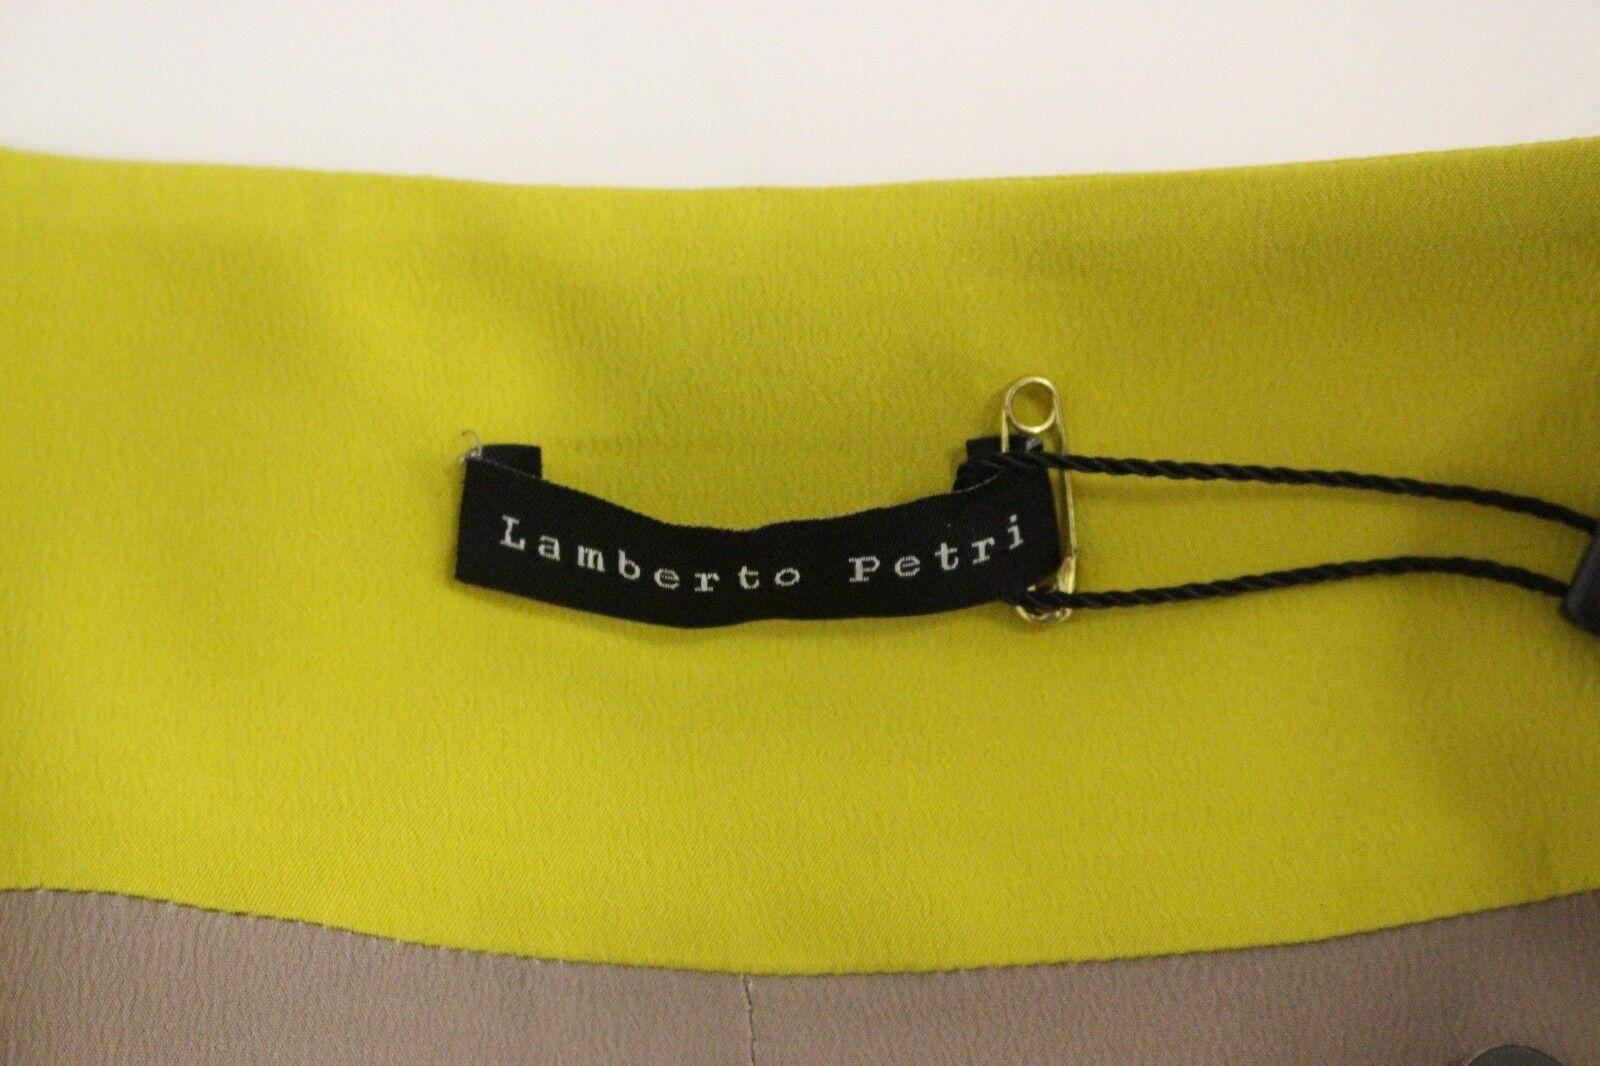 Nuevo Con Etiquetas  600 Lamberto Petri amarillo mostaza mostaza mostaza Blazer Chaqueta Gabardina IT42 US8 M de seda 9e40dd